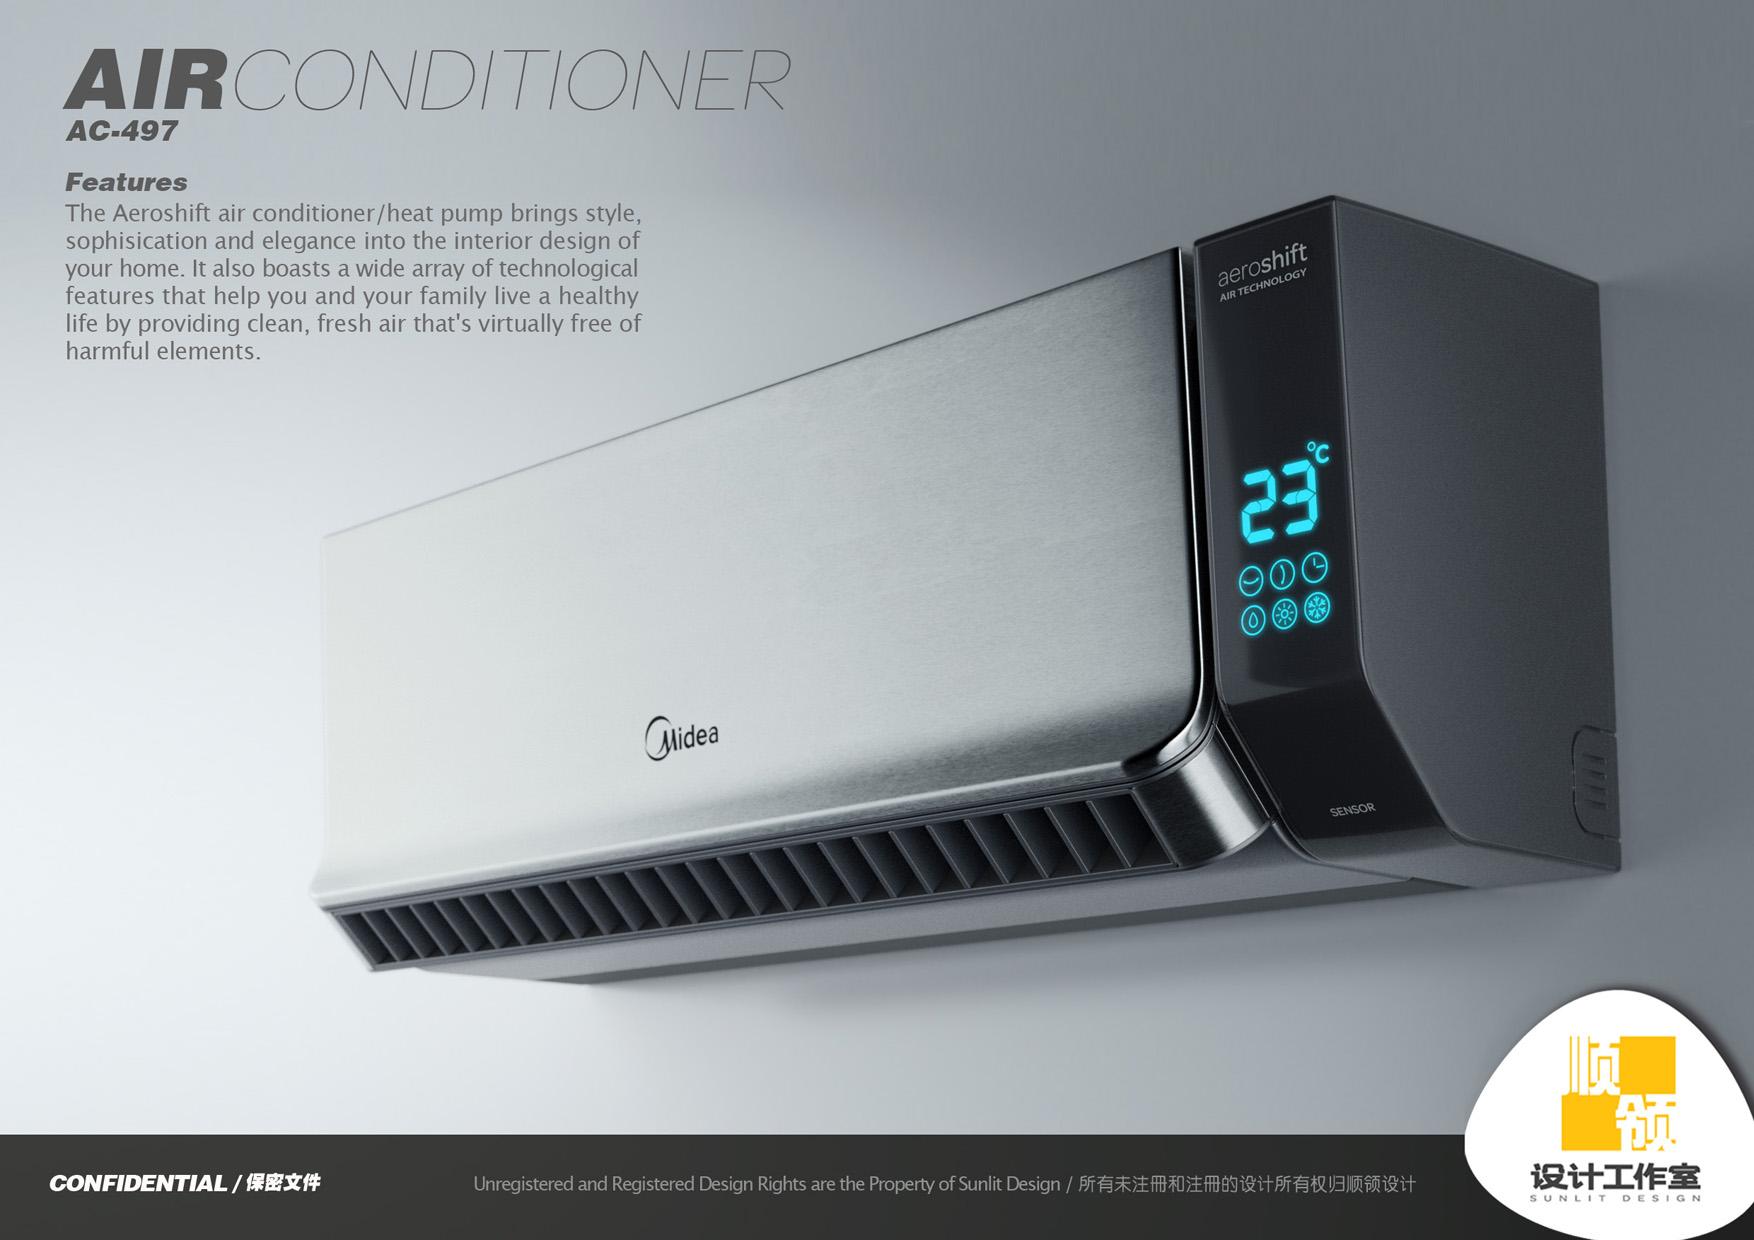 Midea Air Conditioner by Hugo Cailleton at Coroflot.com #CB9800